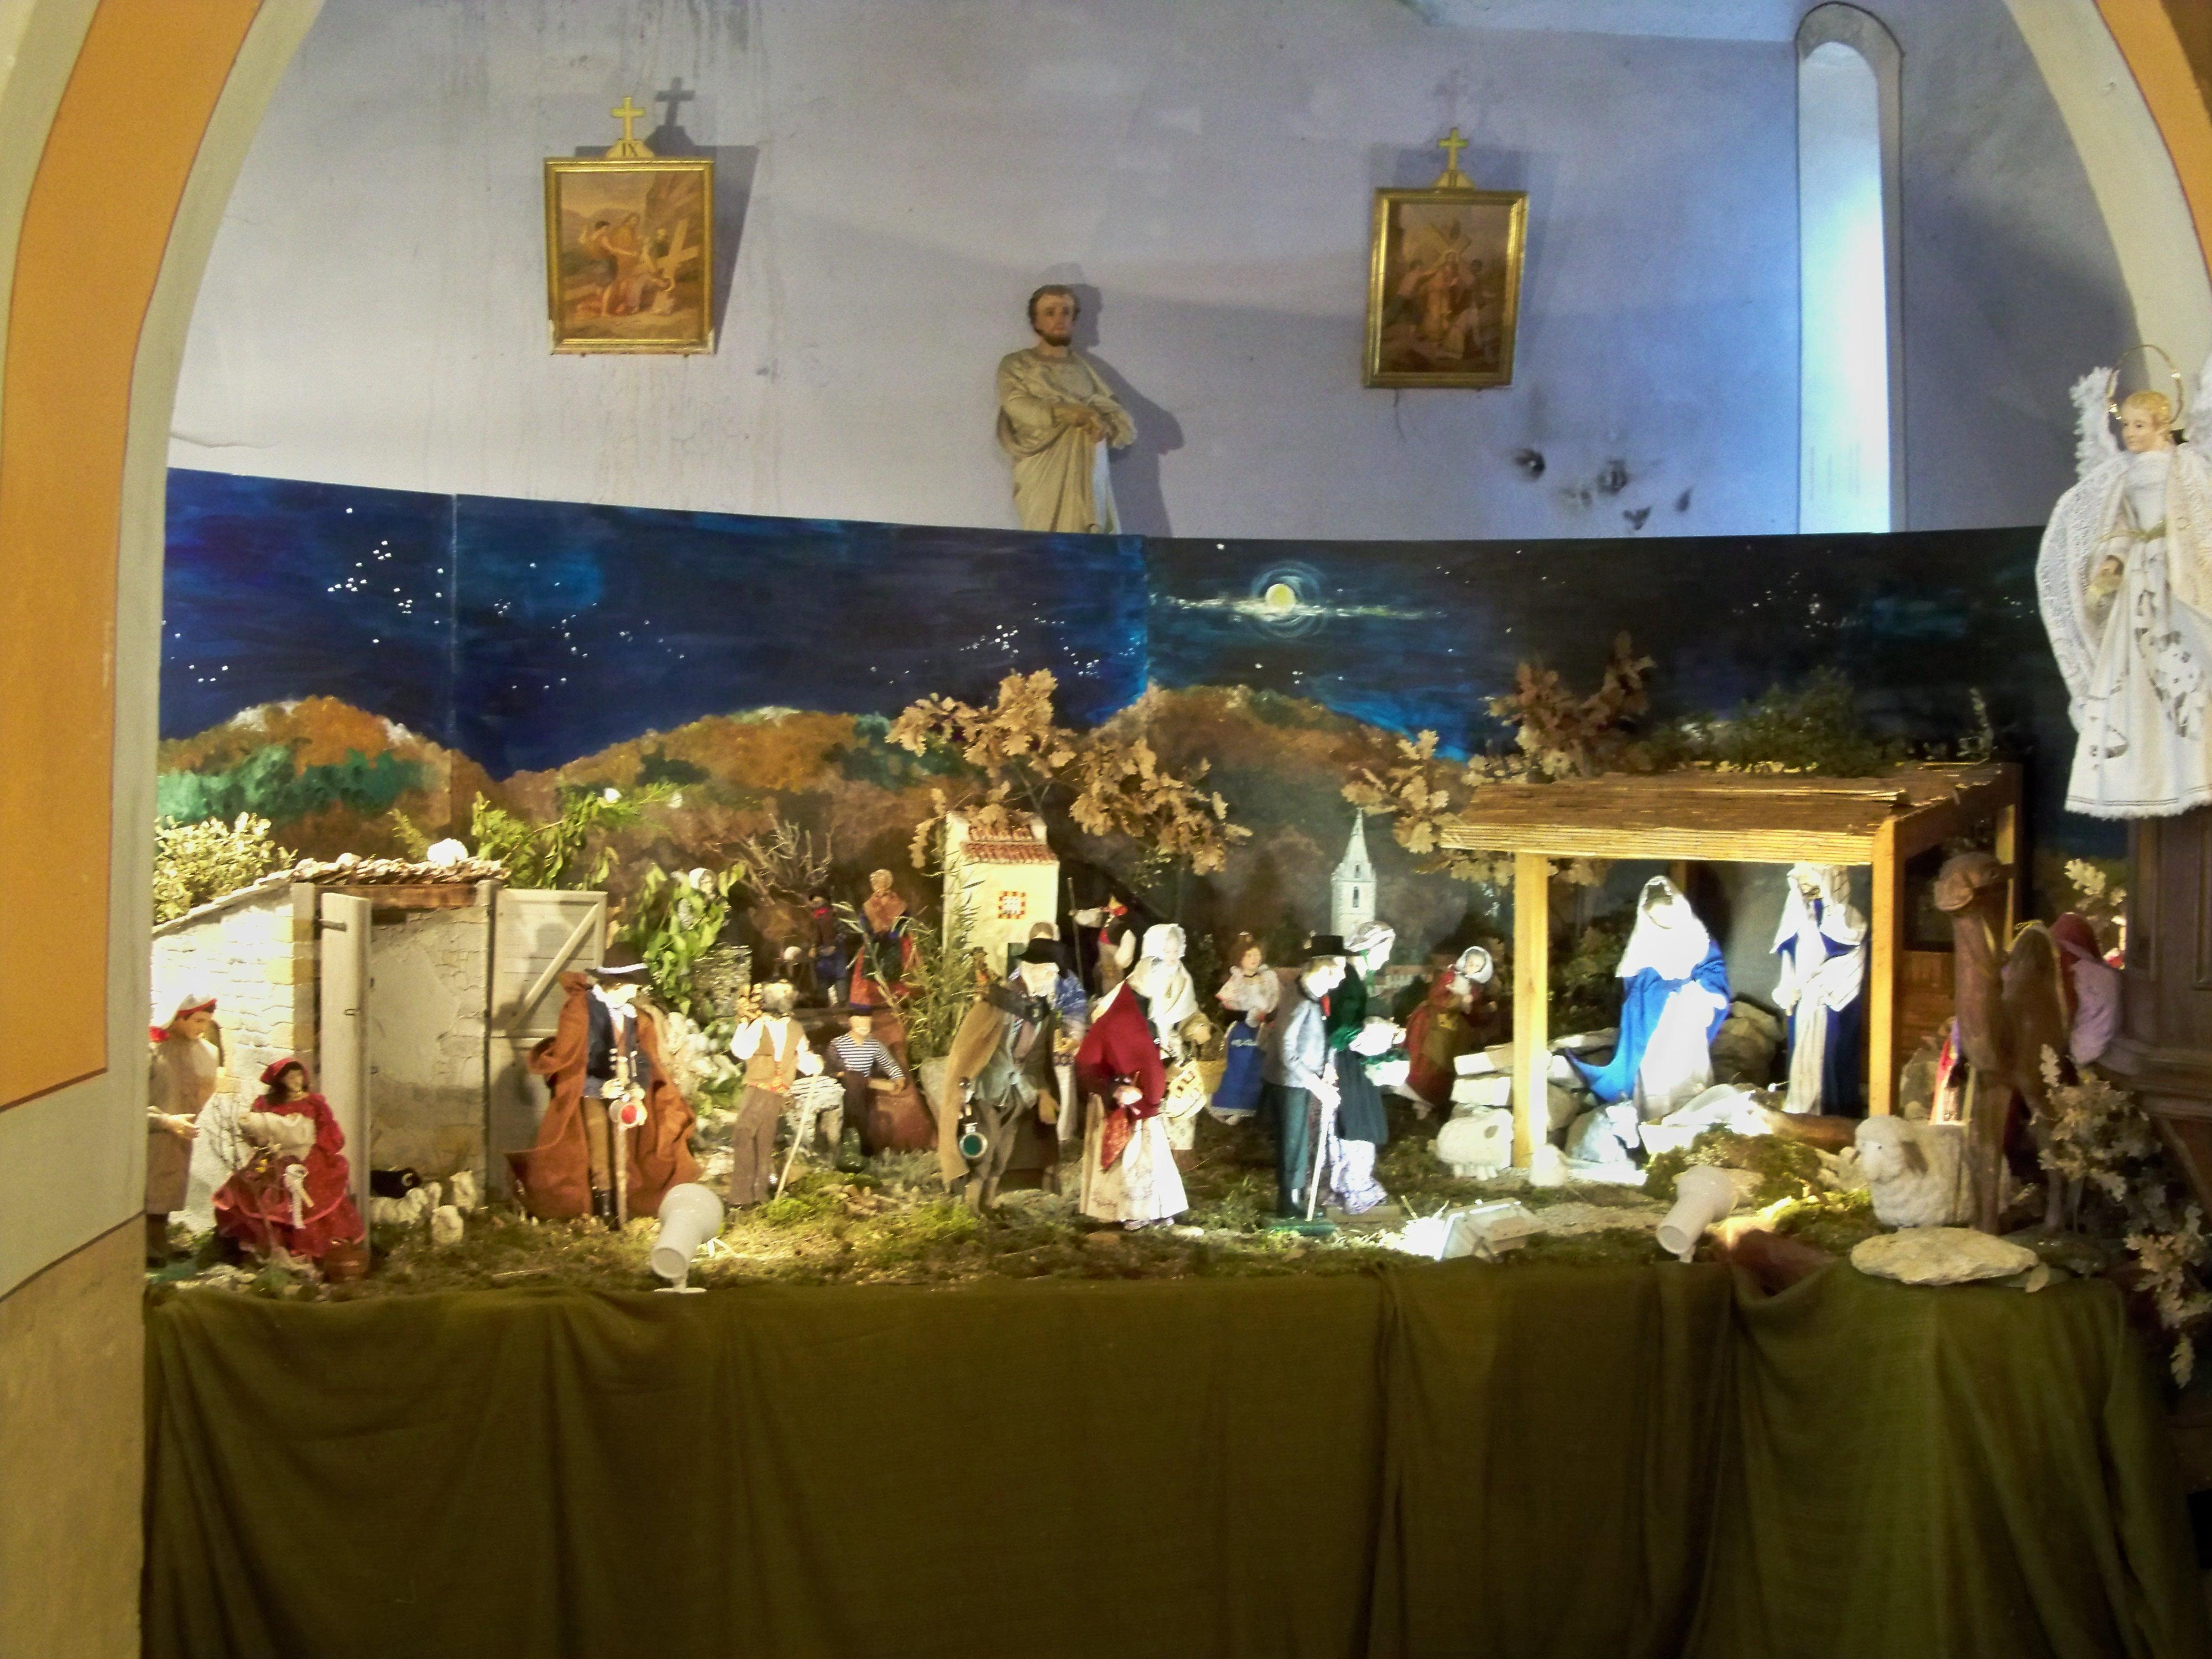 Village De Decoration De Noel